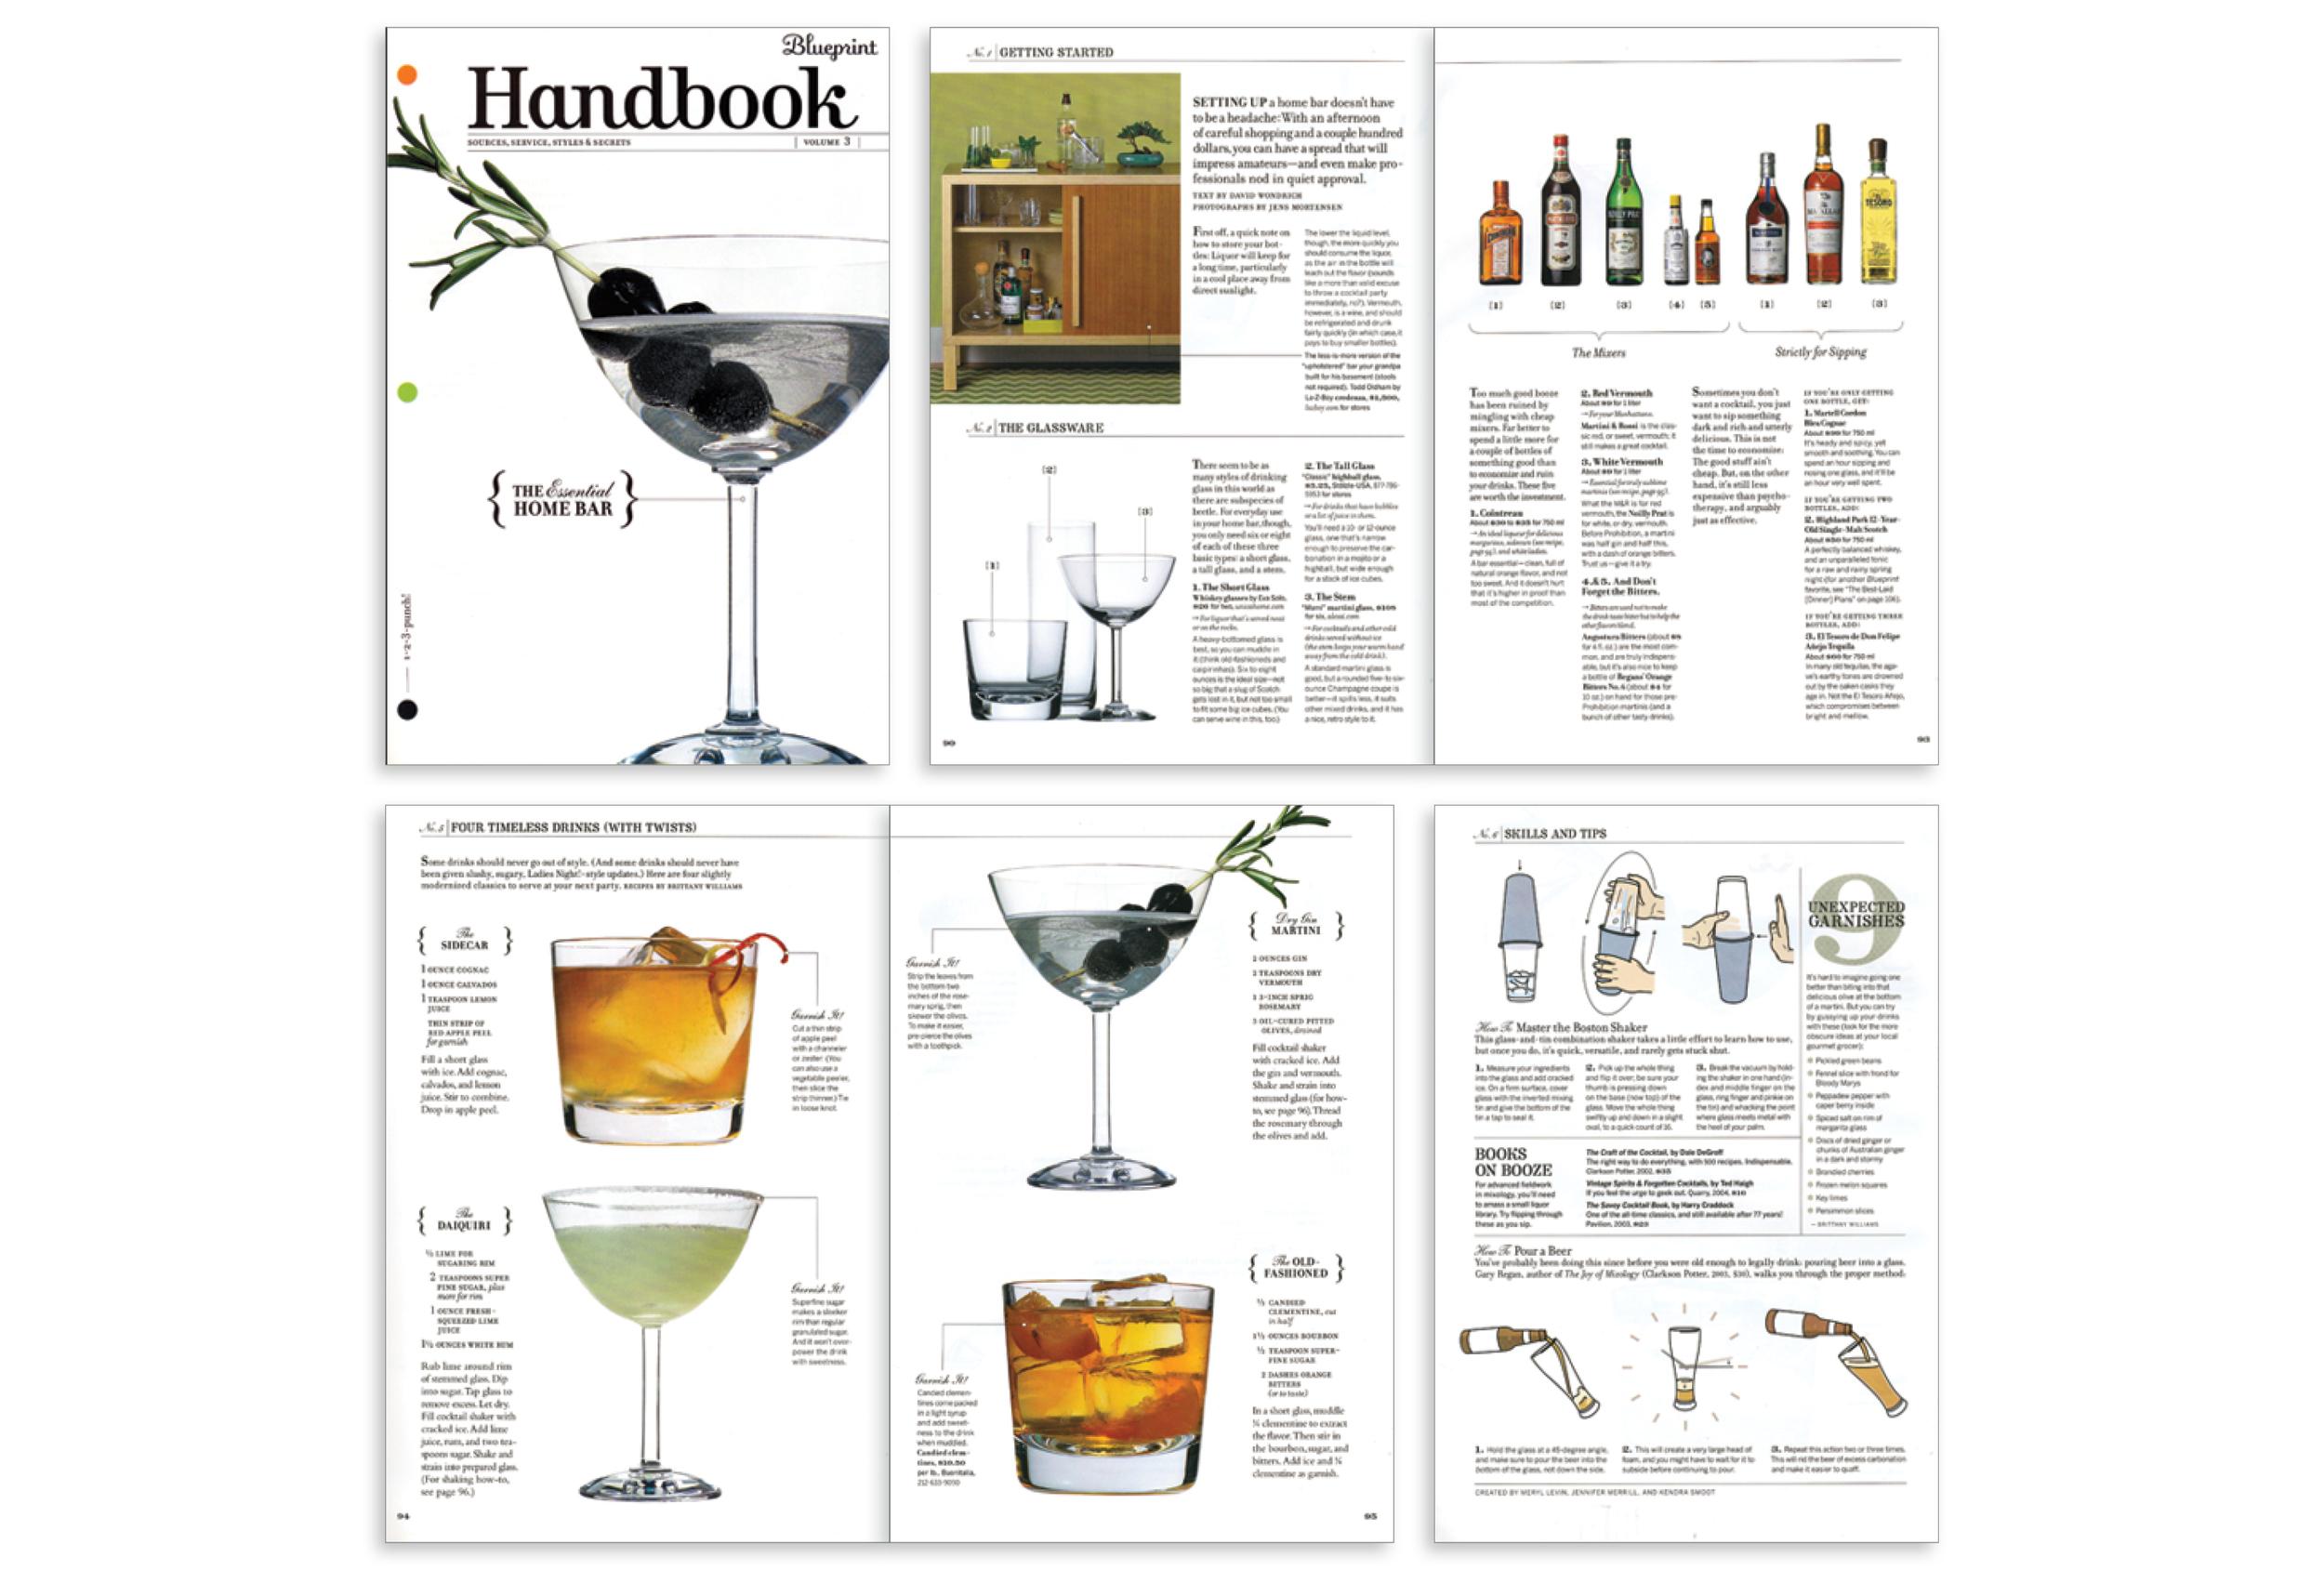 Handbook: Home Bar